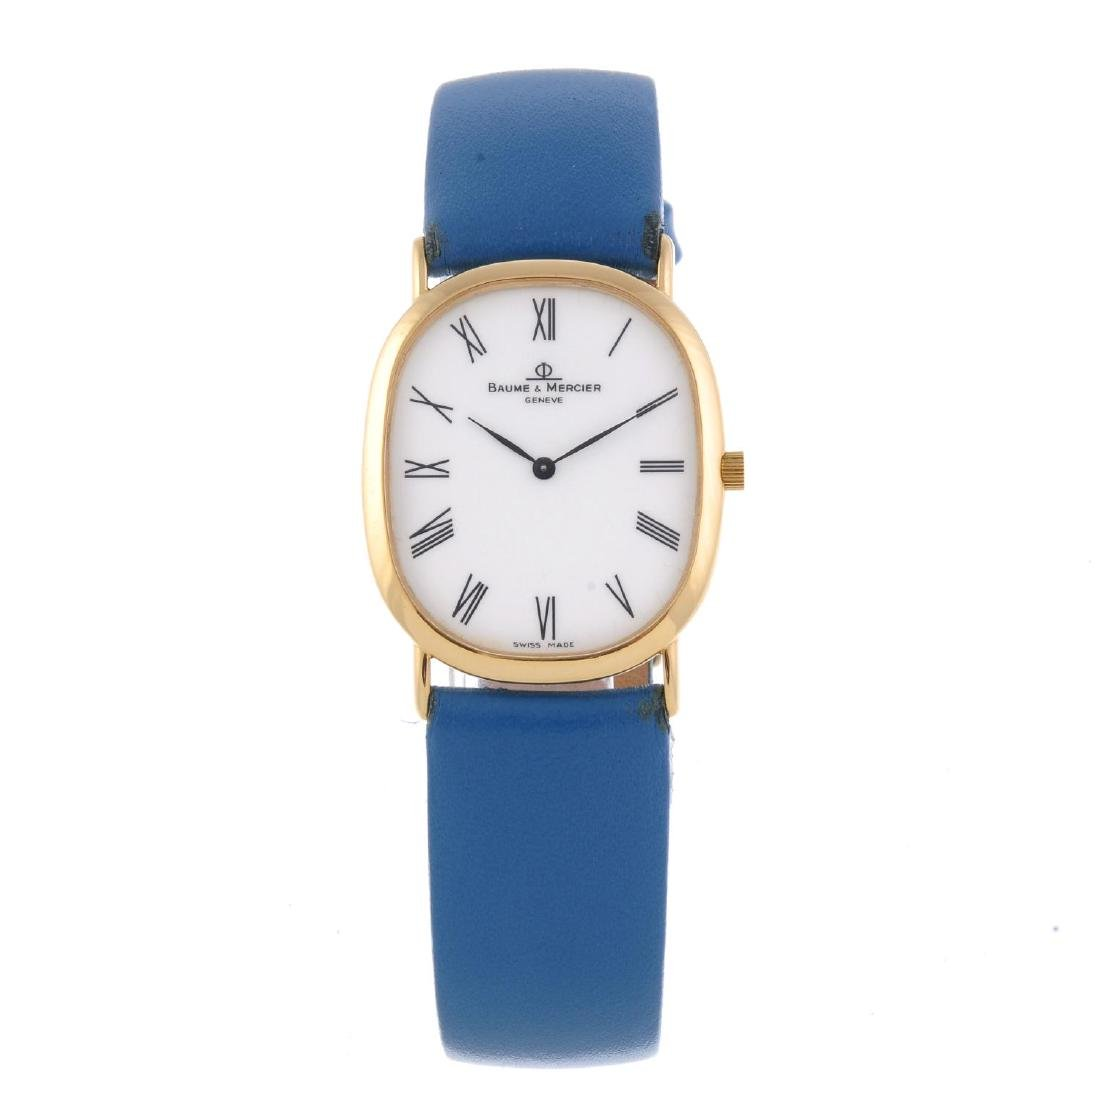 BAUME & MERCIER - a gentleman's wrist watch. 18ct